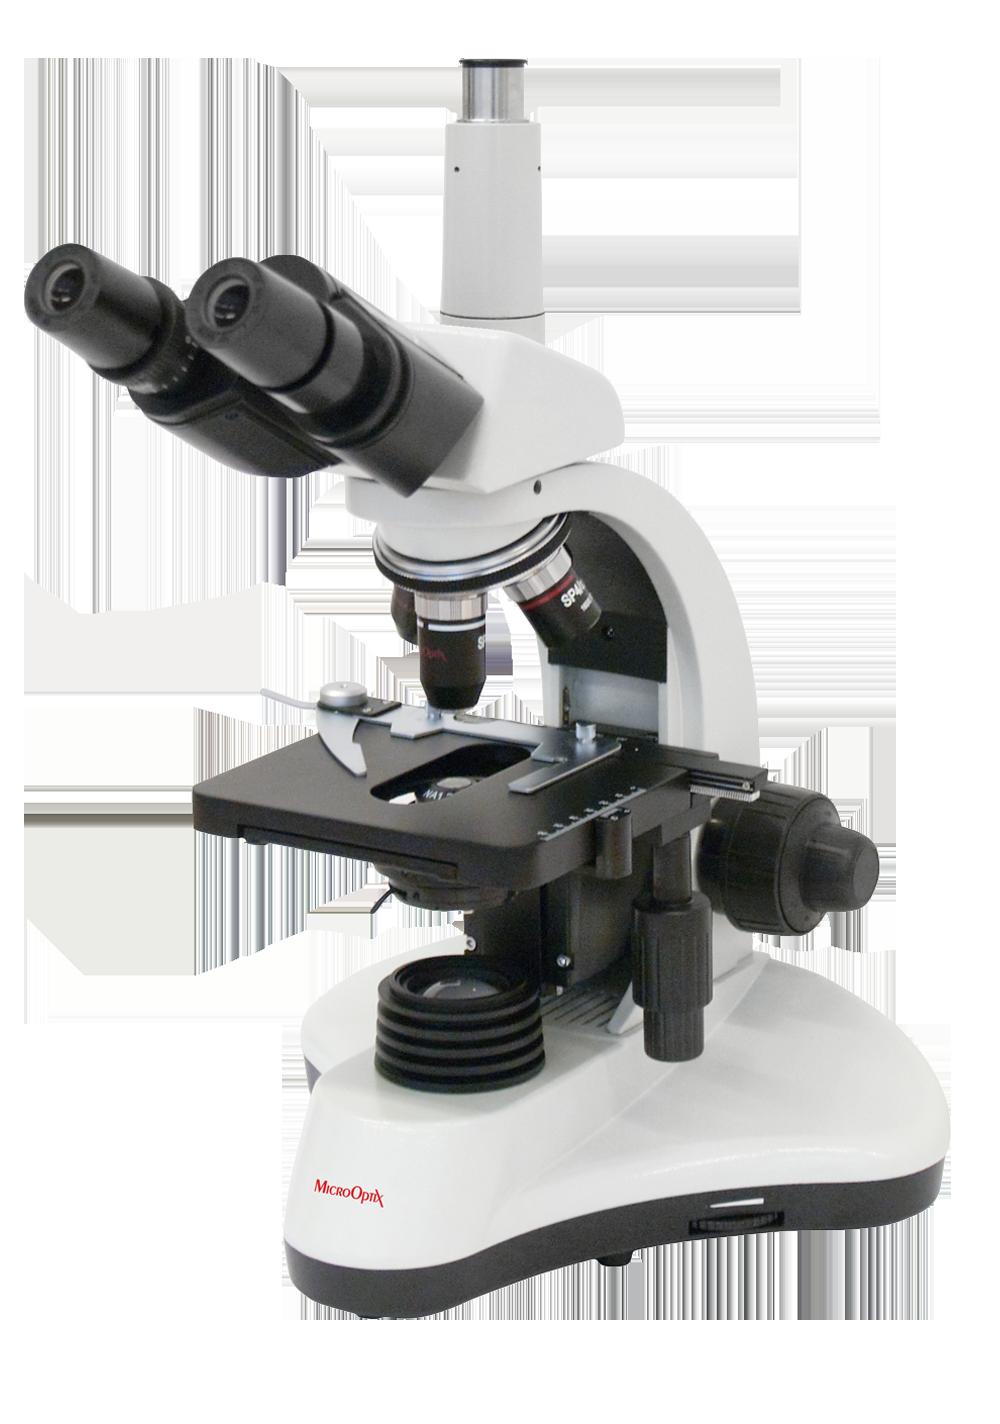 MX 100 / MX 100 (T) Biological microscope